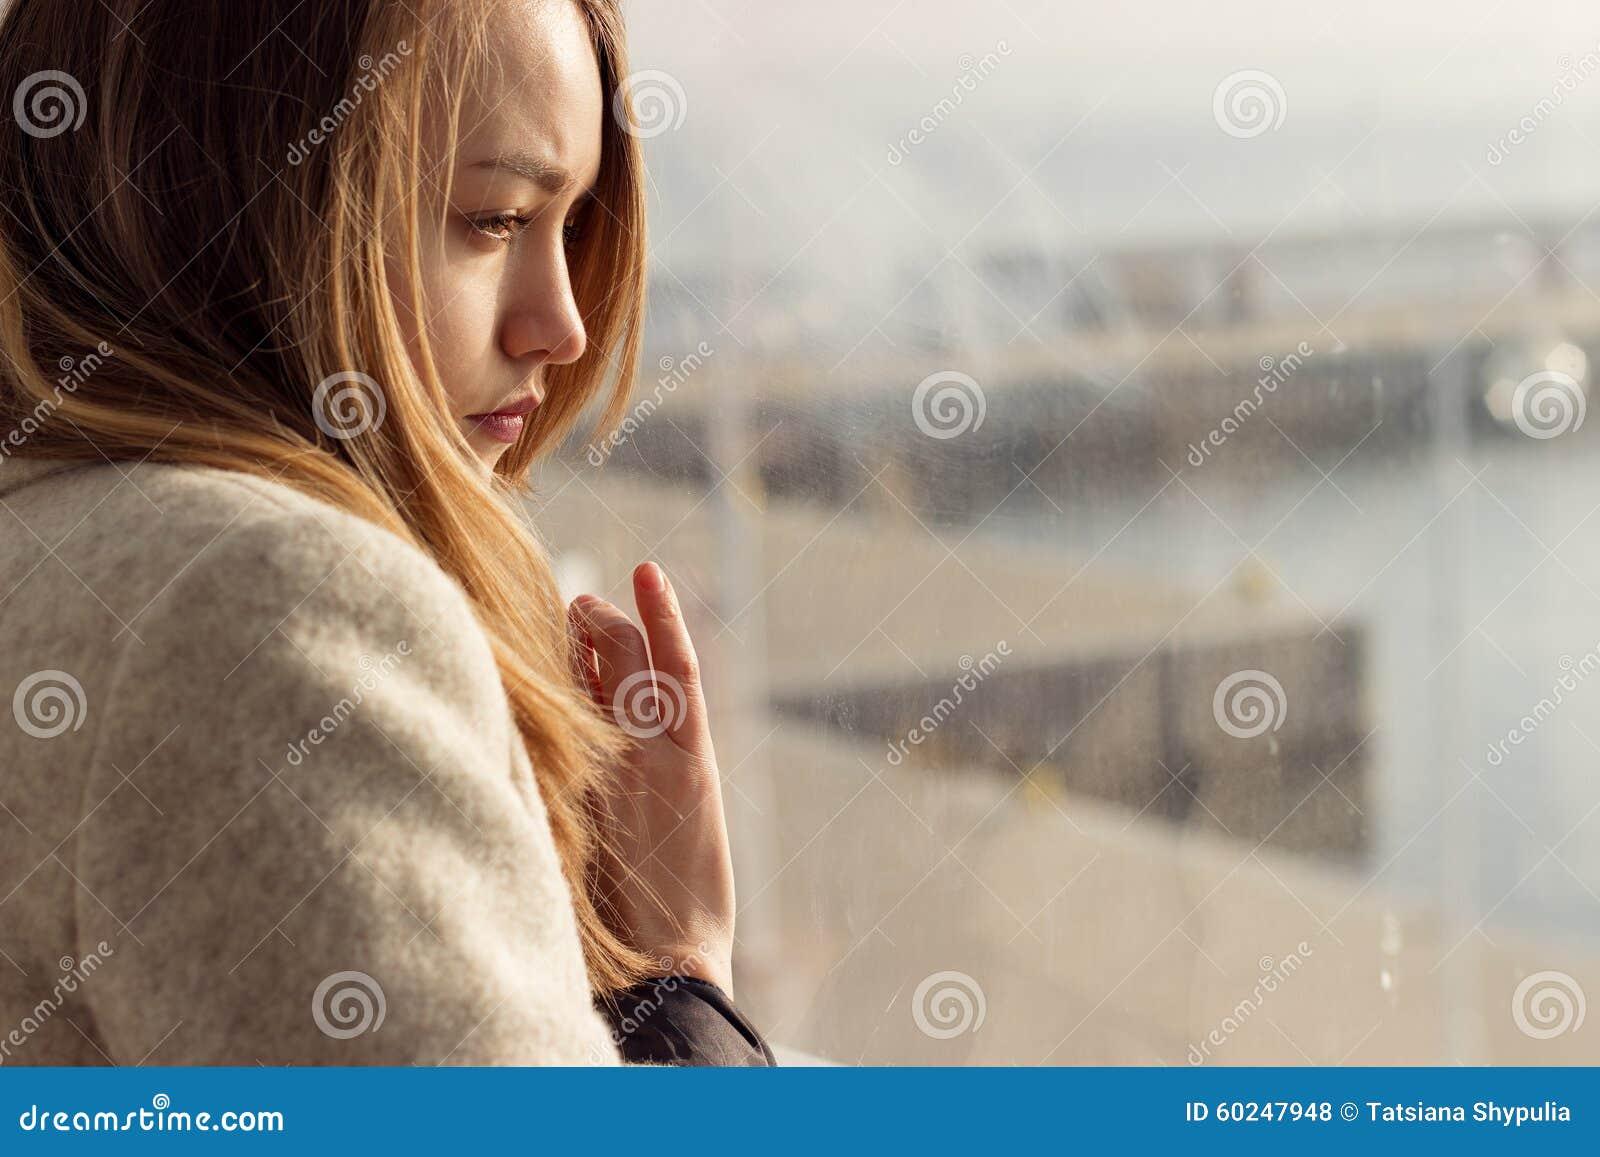 sad lonely girl photos